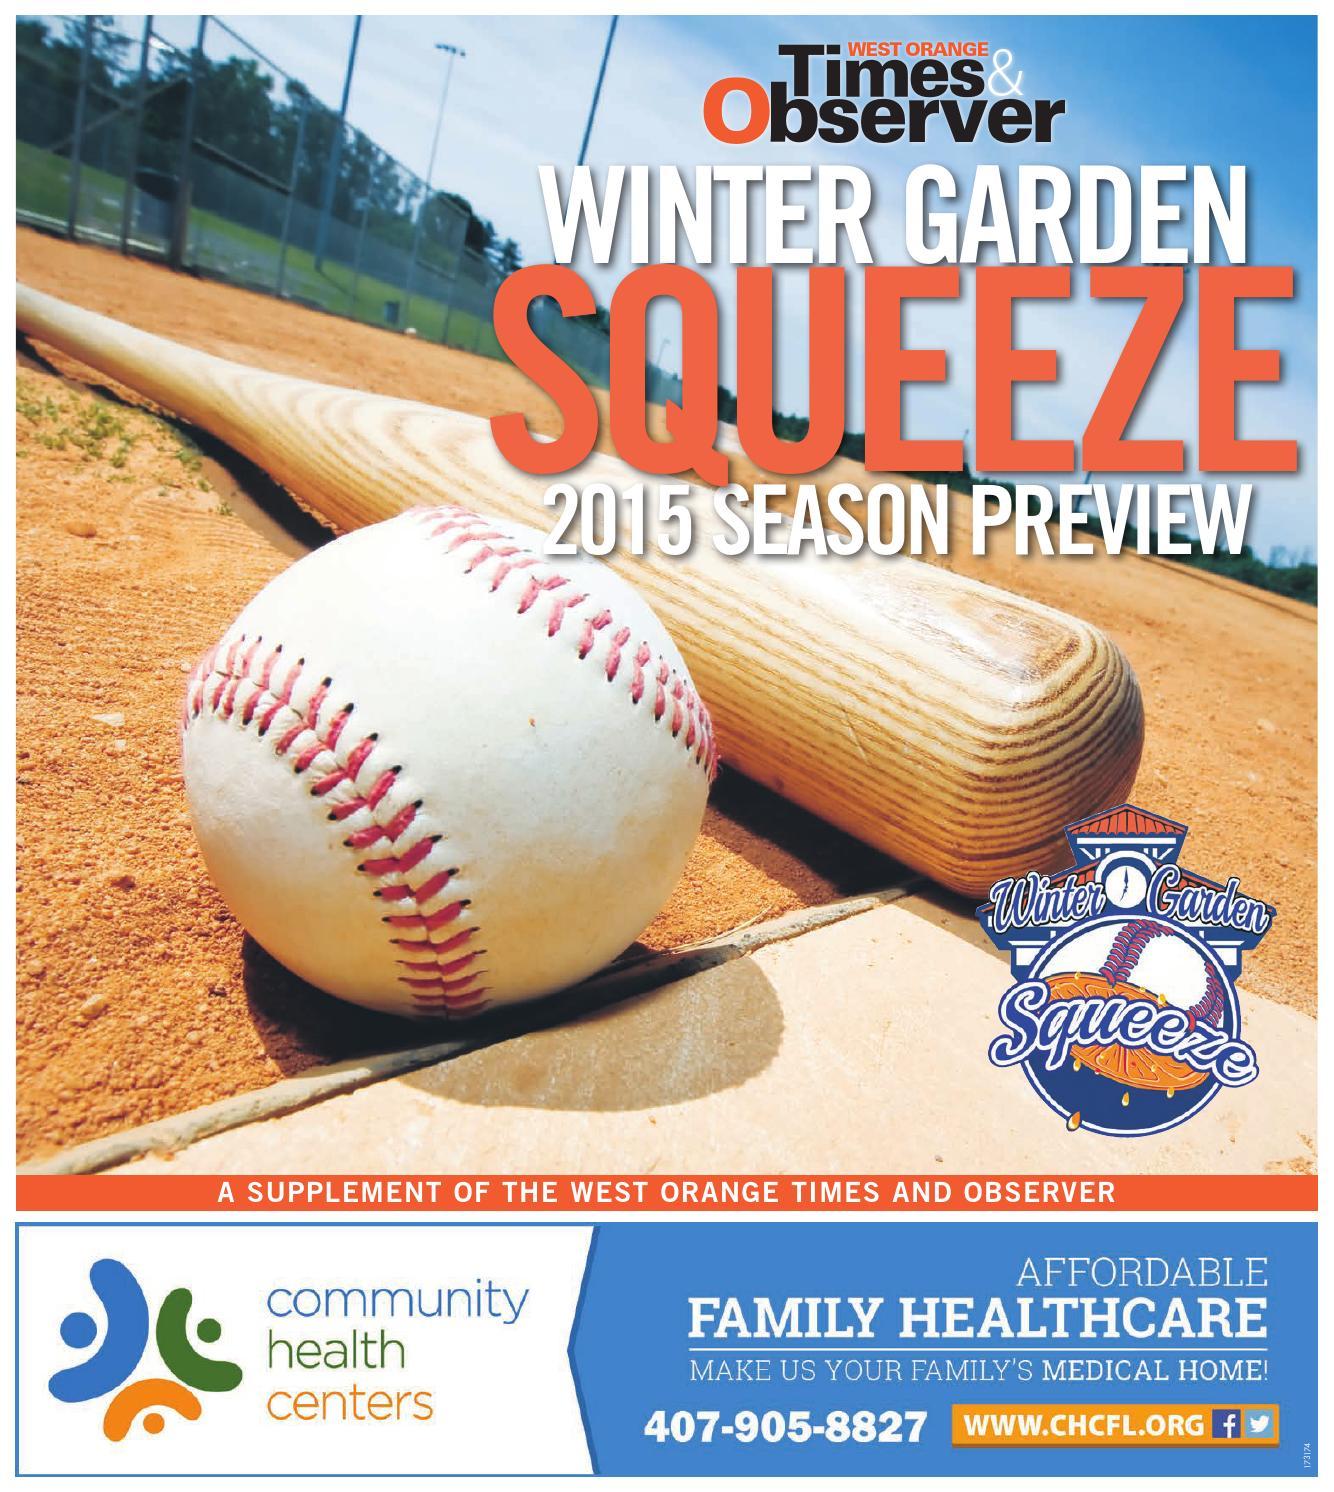 06 04 15 winter garden squeeze 2015 season preview by orange